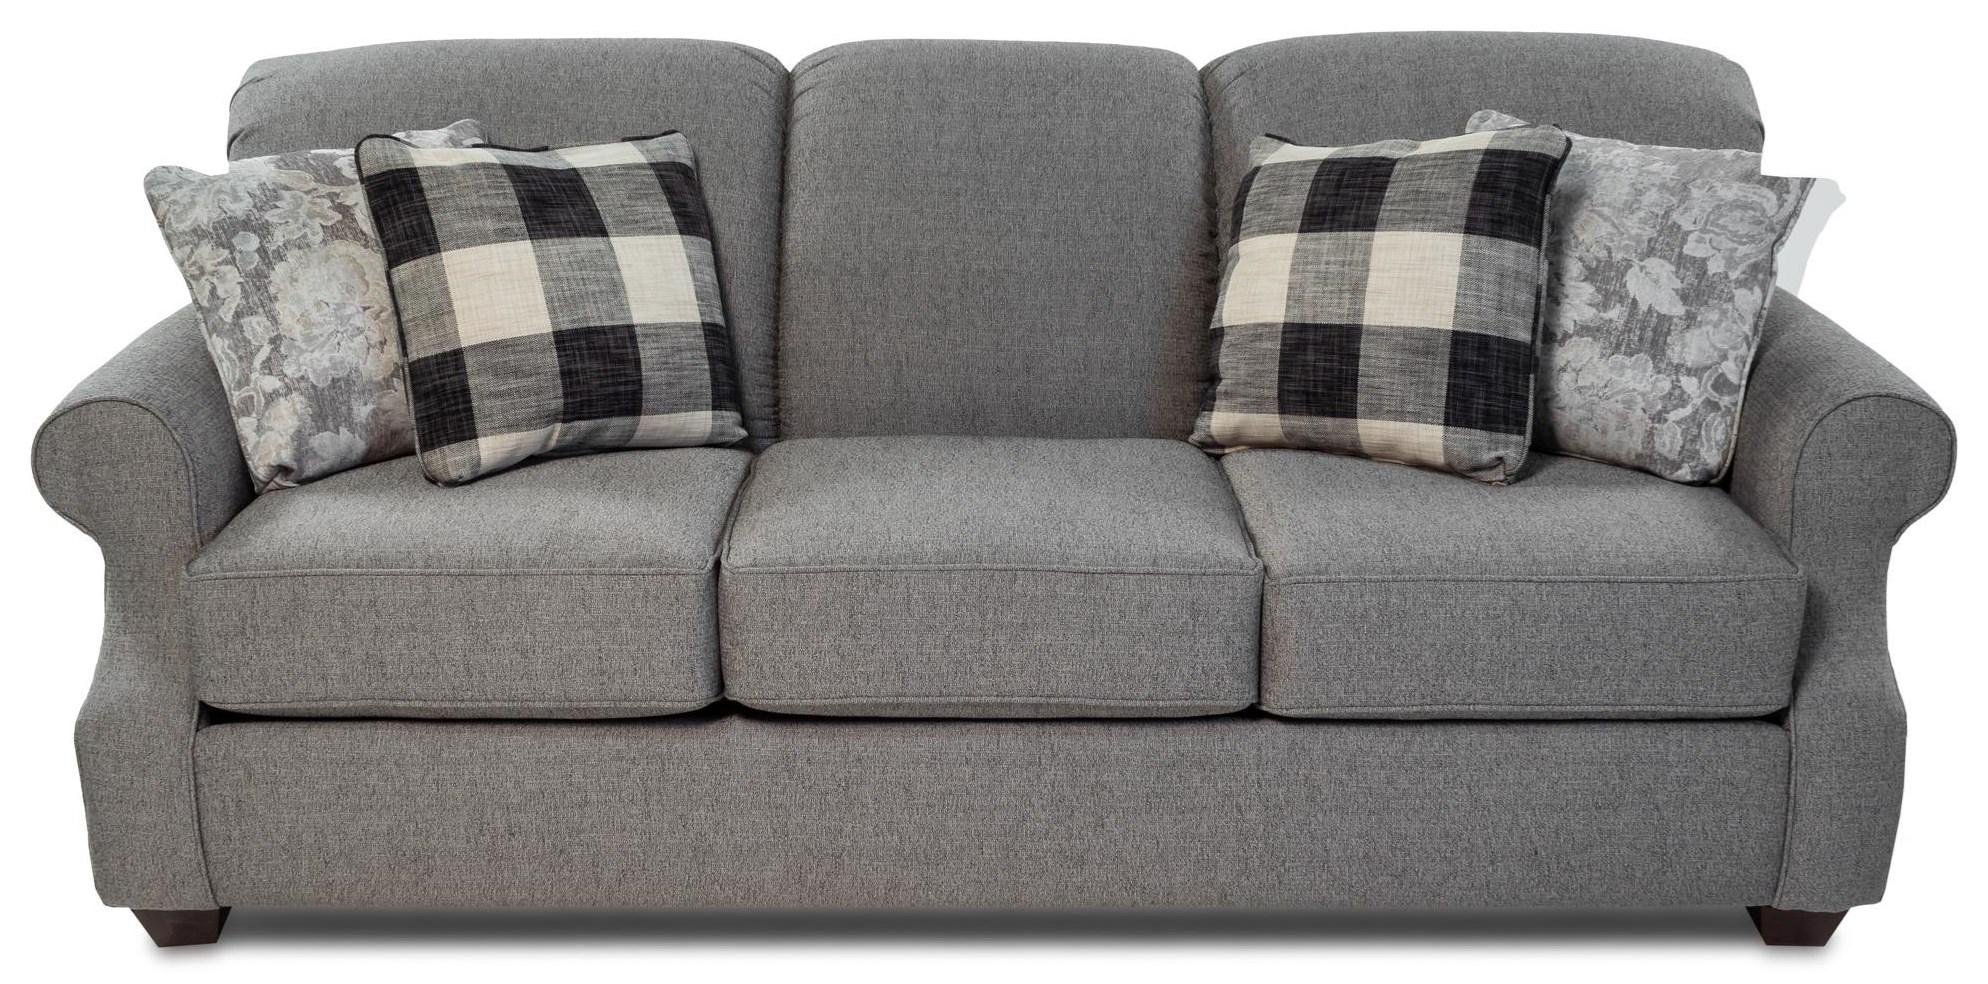 Astonishing Windfall Roll Arm Sofa Machost Co Dining Chair Design Ideas Machostcouk